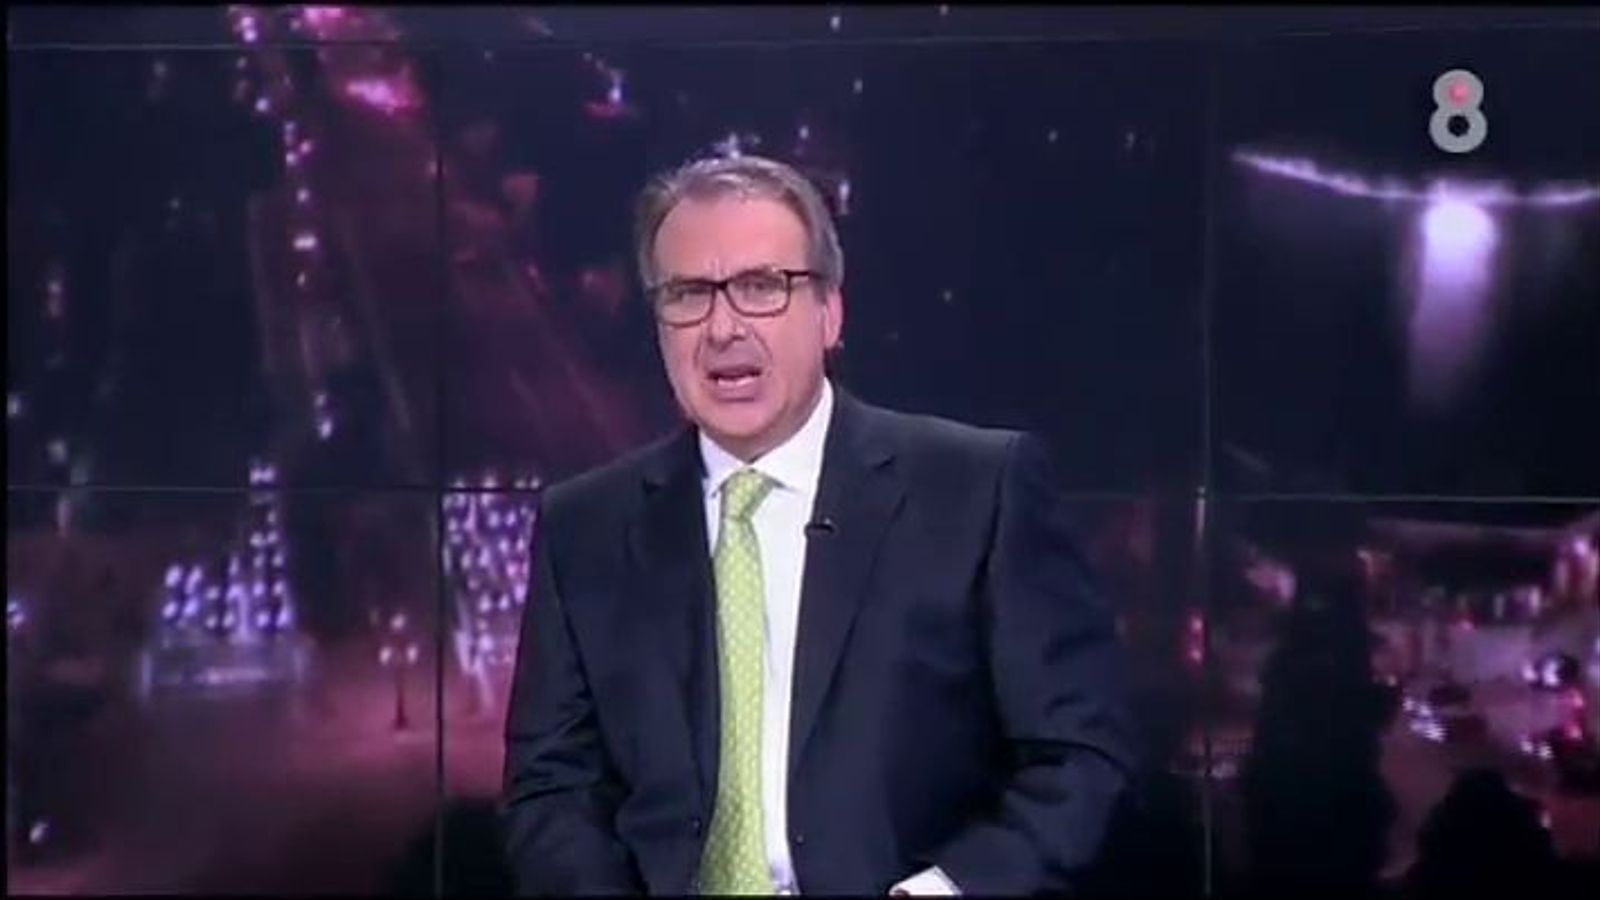 Josep Cuní lamenta que no s'hagi pogut celebrar el debat de 8TV